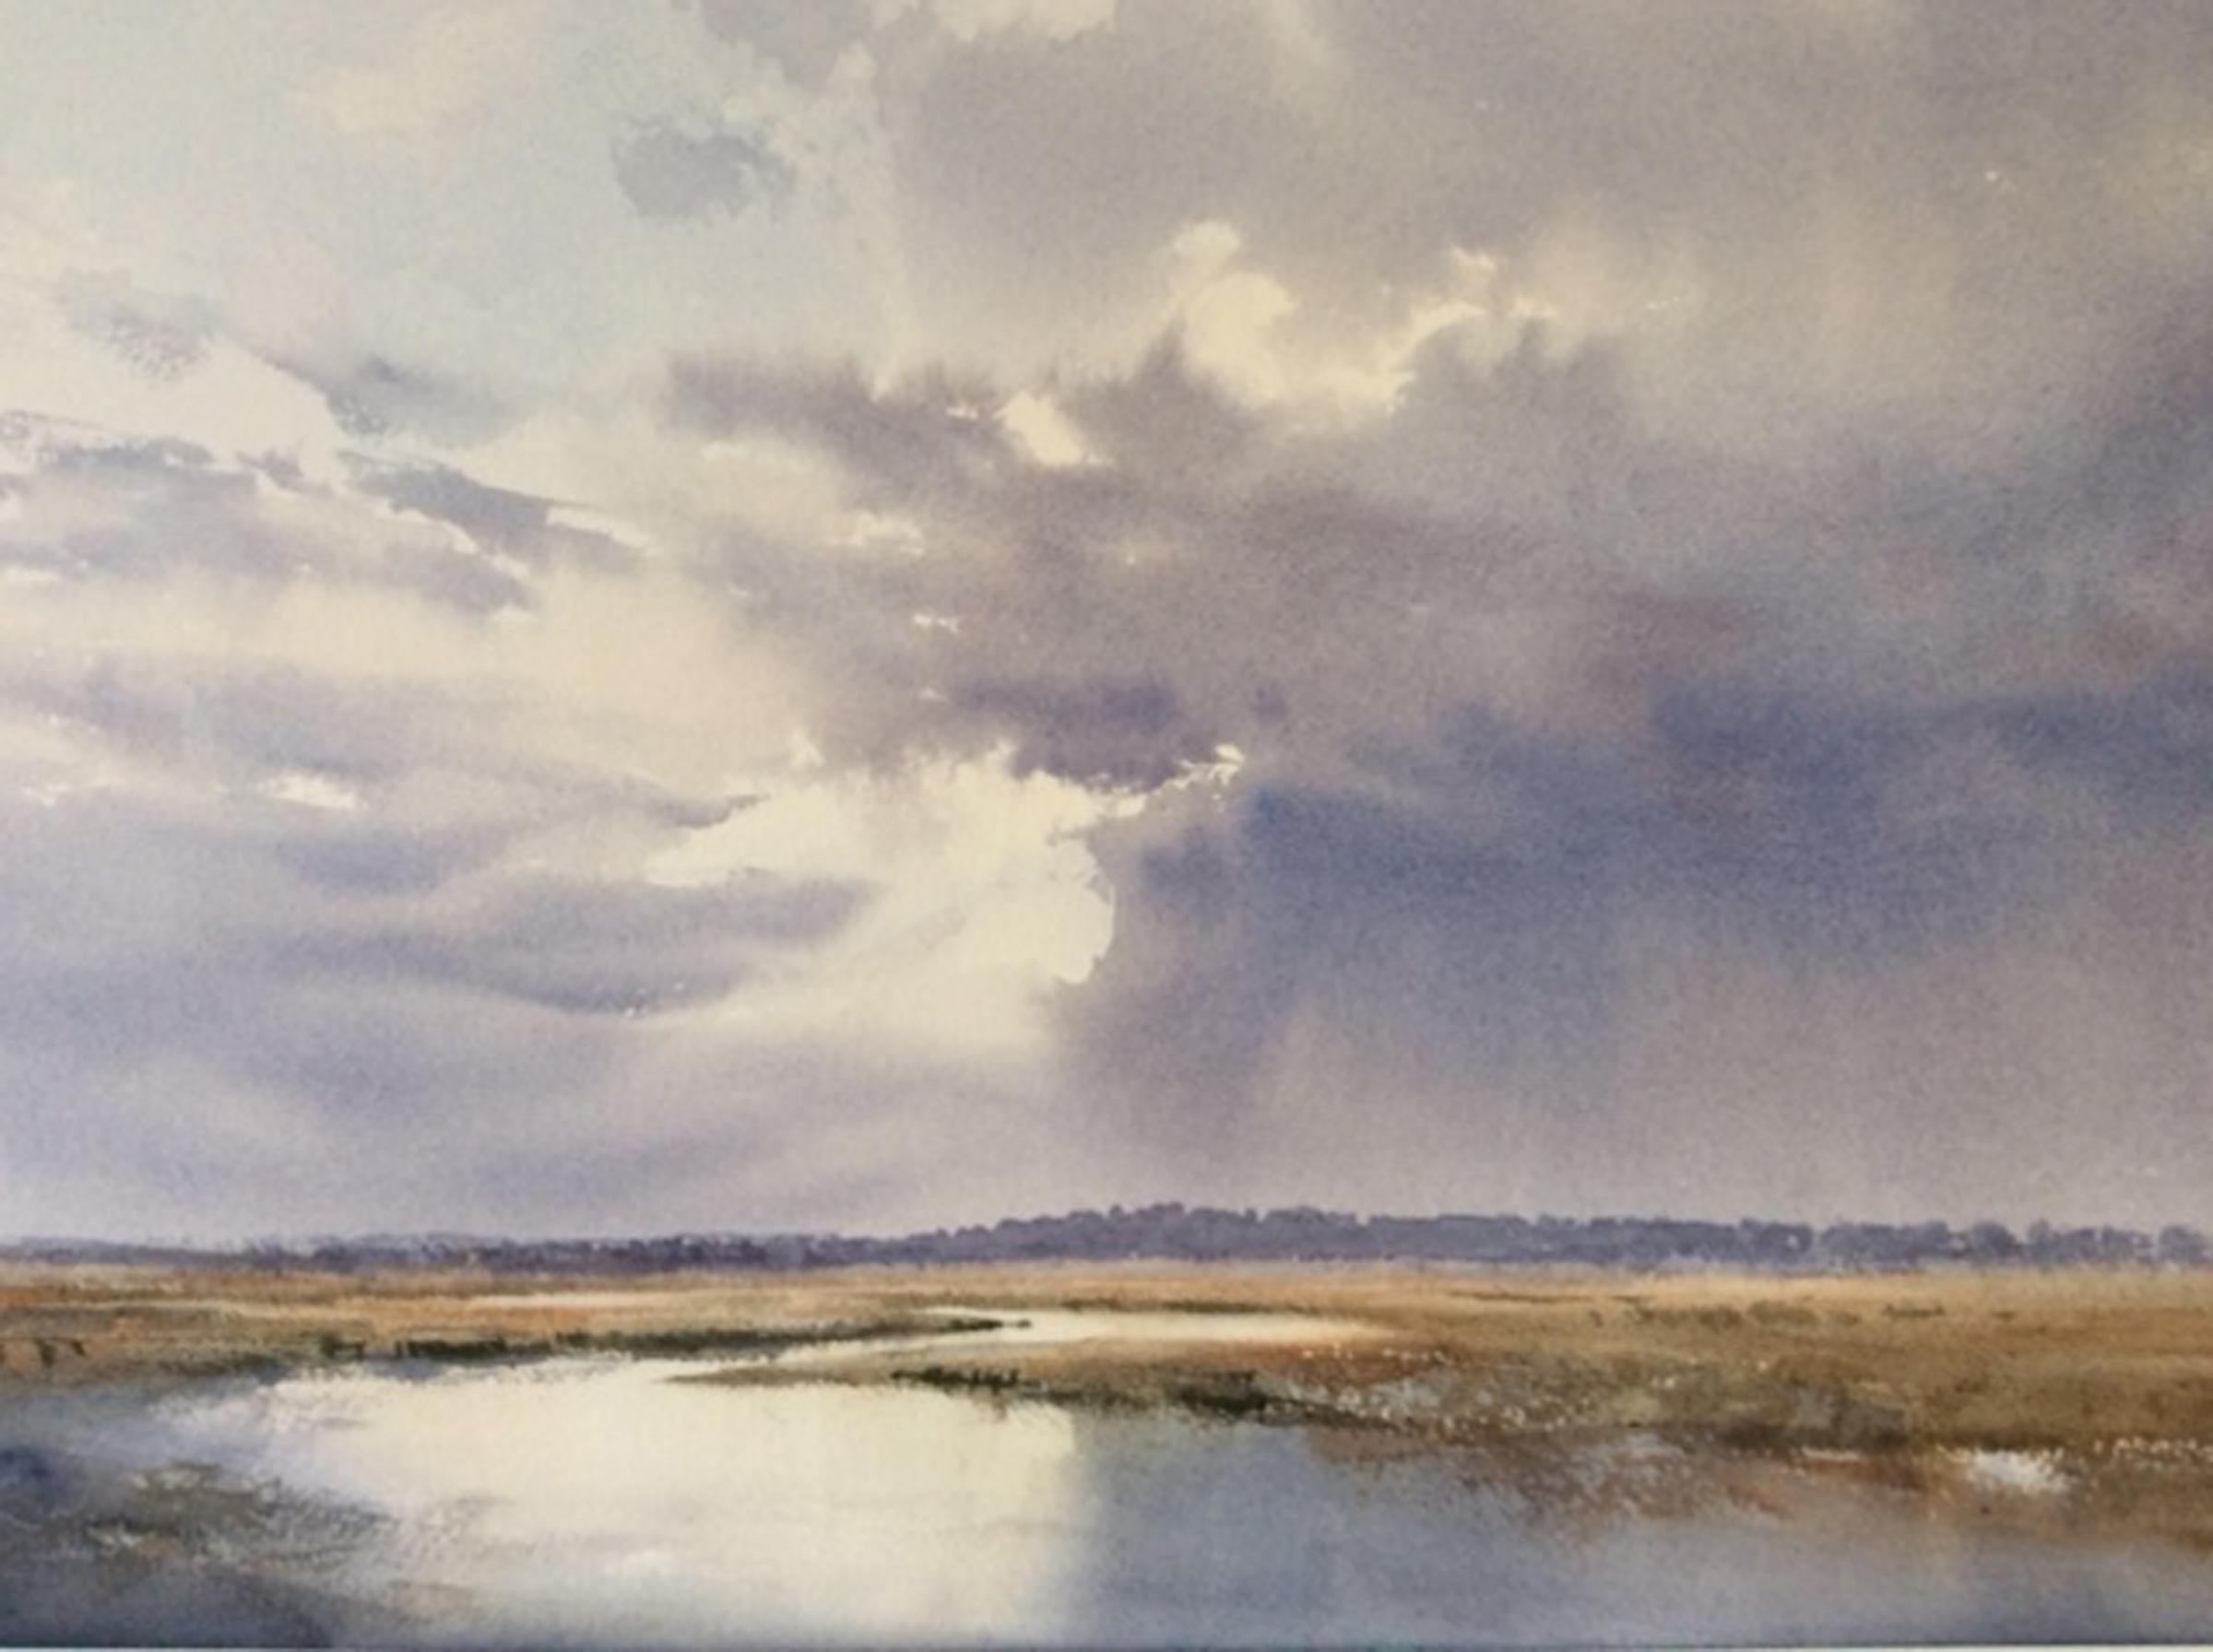 William North's Otmoor paintings exhibited in Wantage museum